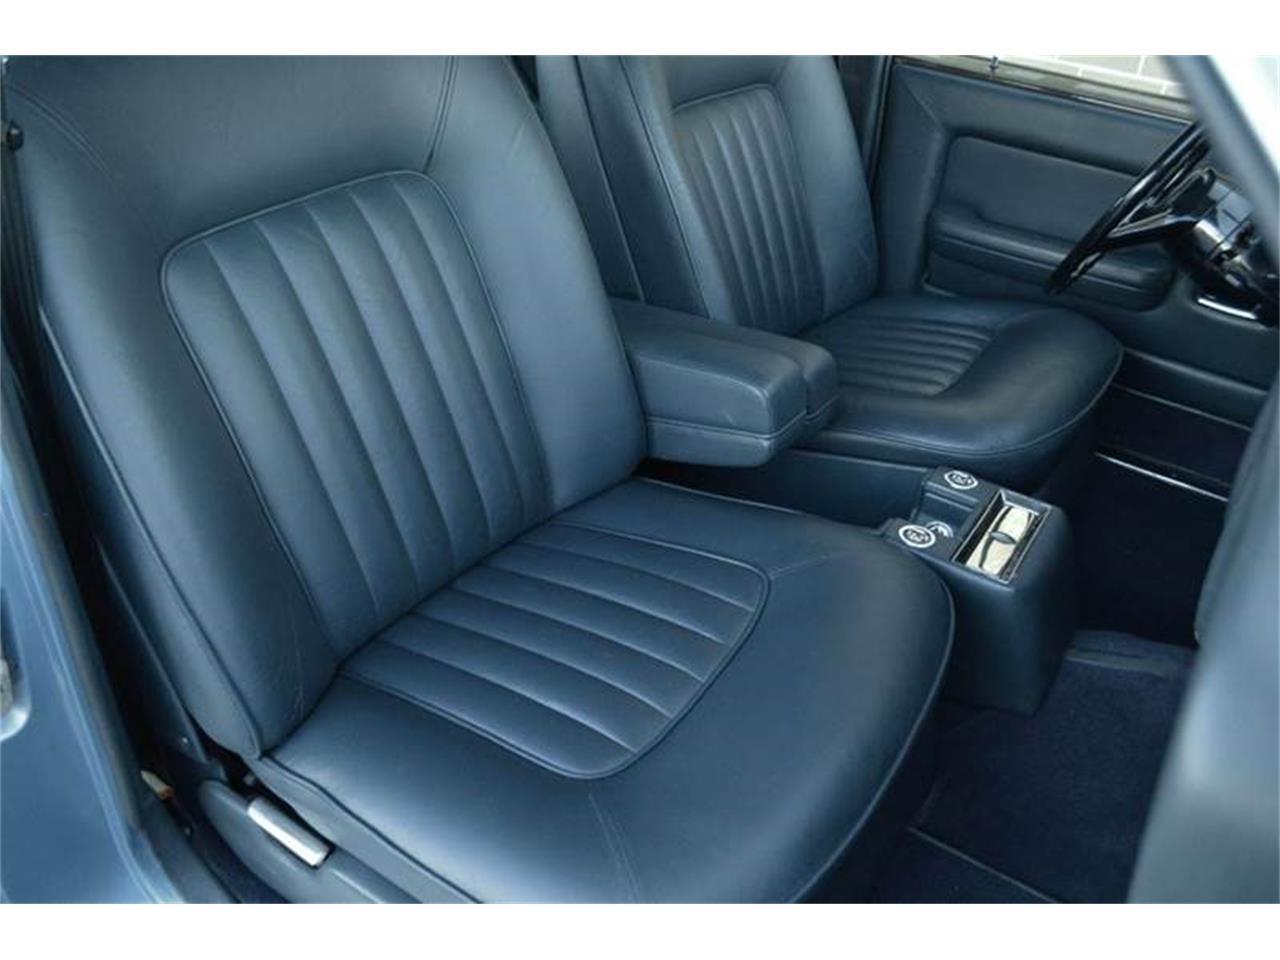 1981 Rolls-Royce Silver Spirit (CC-991537) for sale in Carey, Illinois